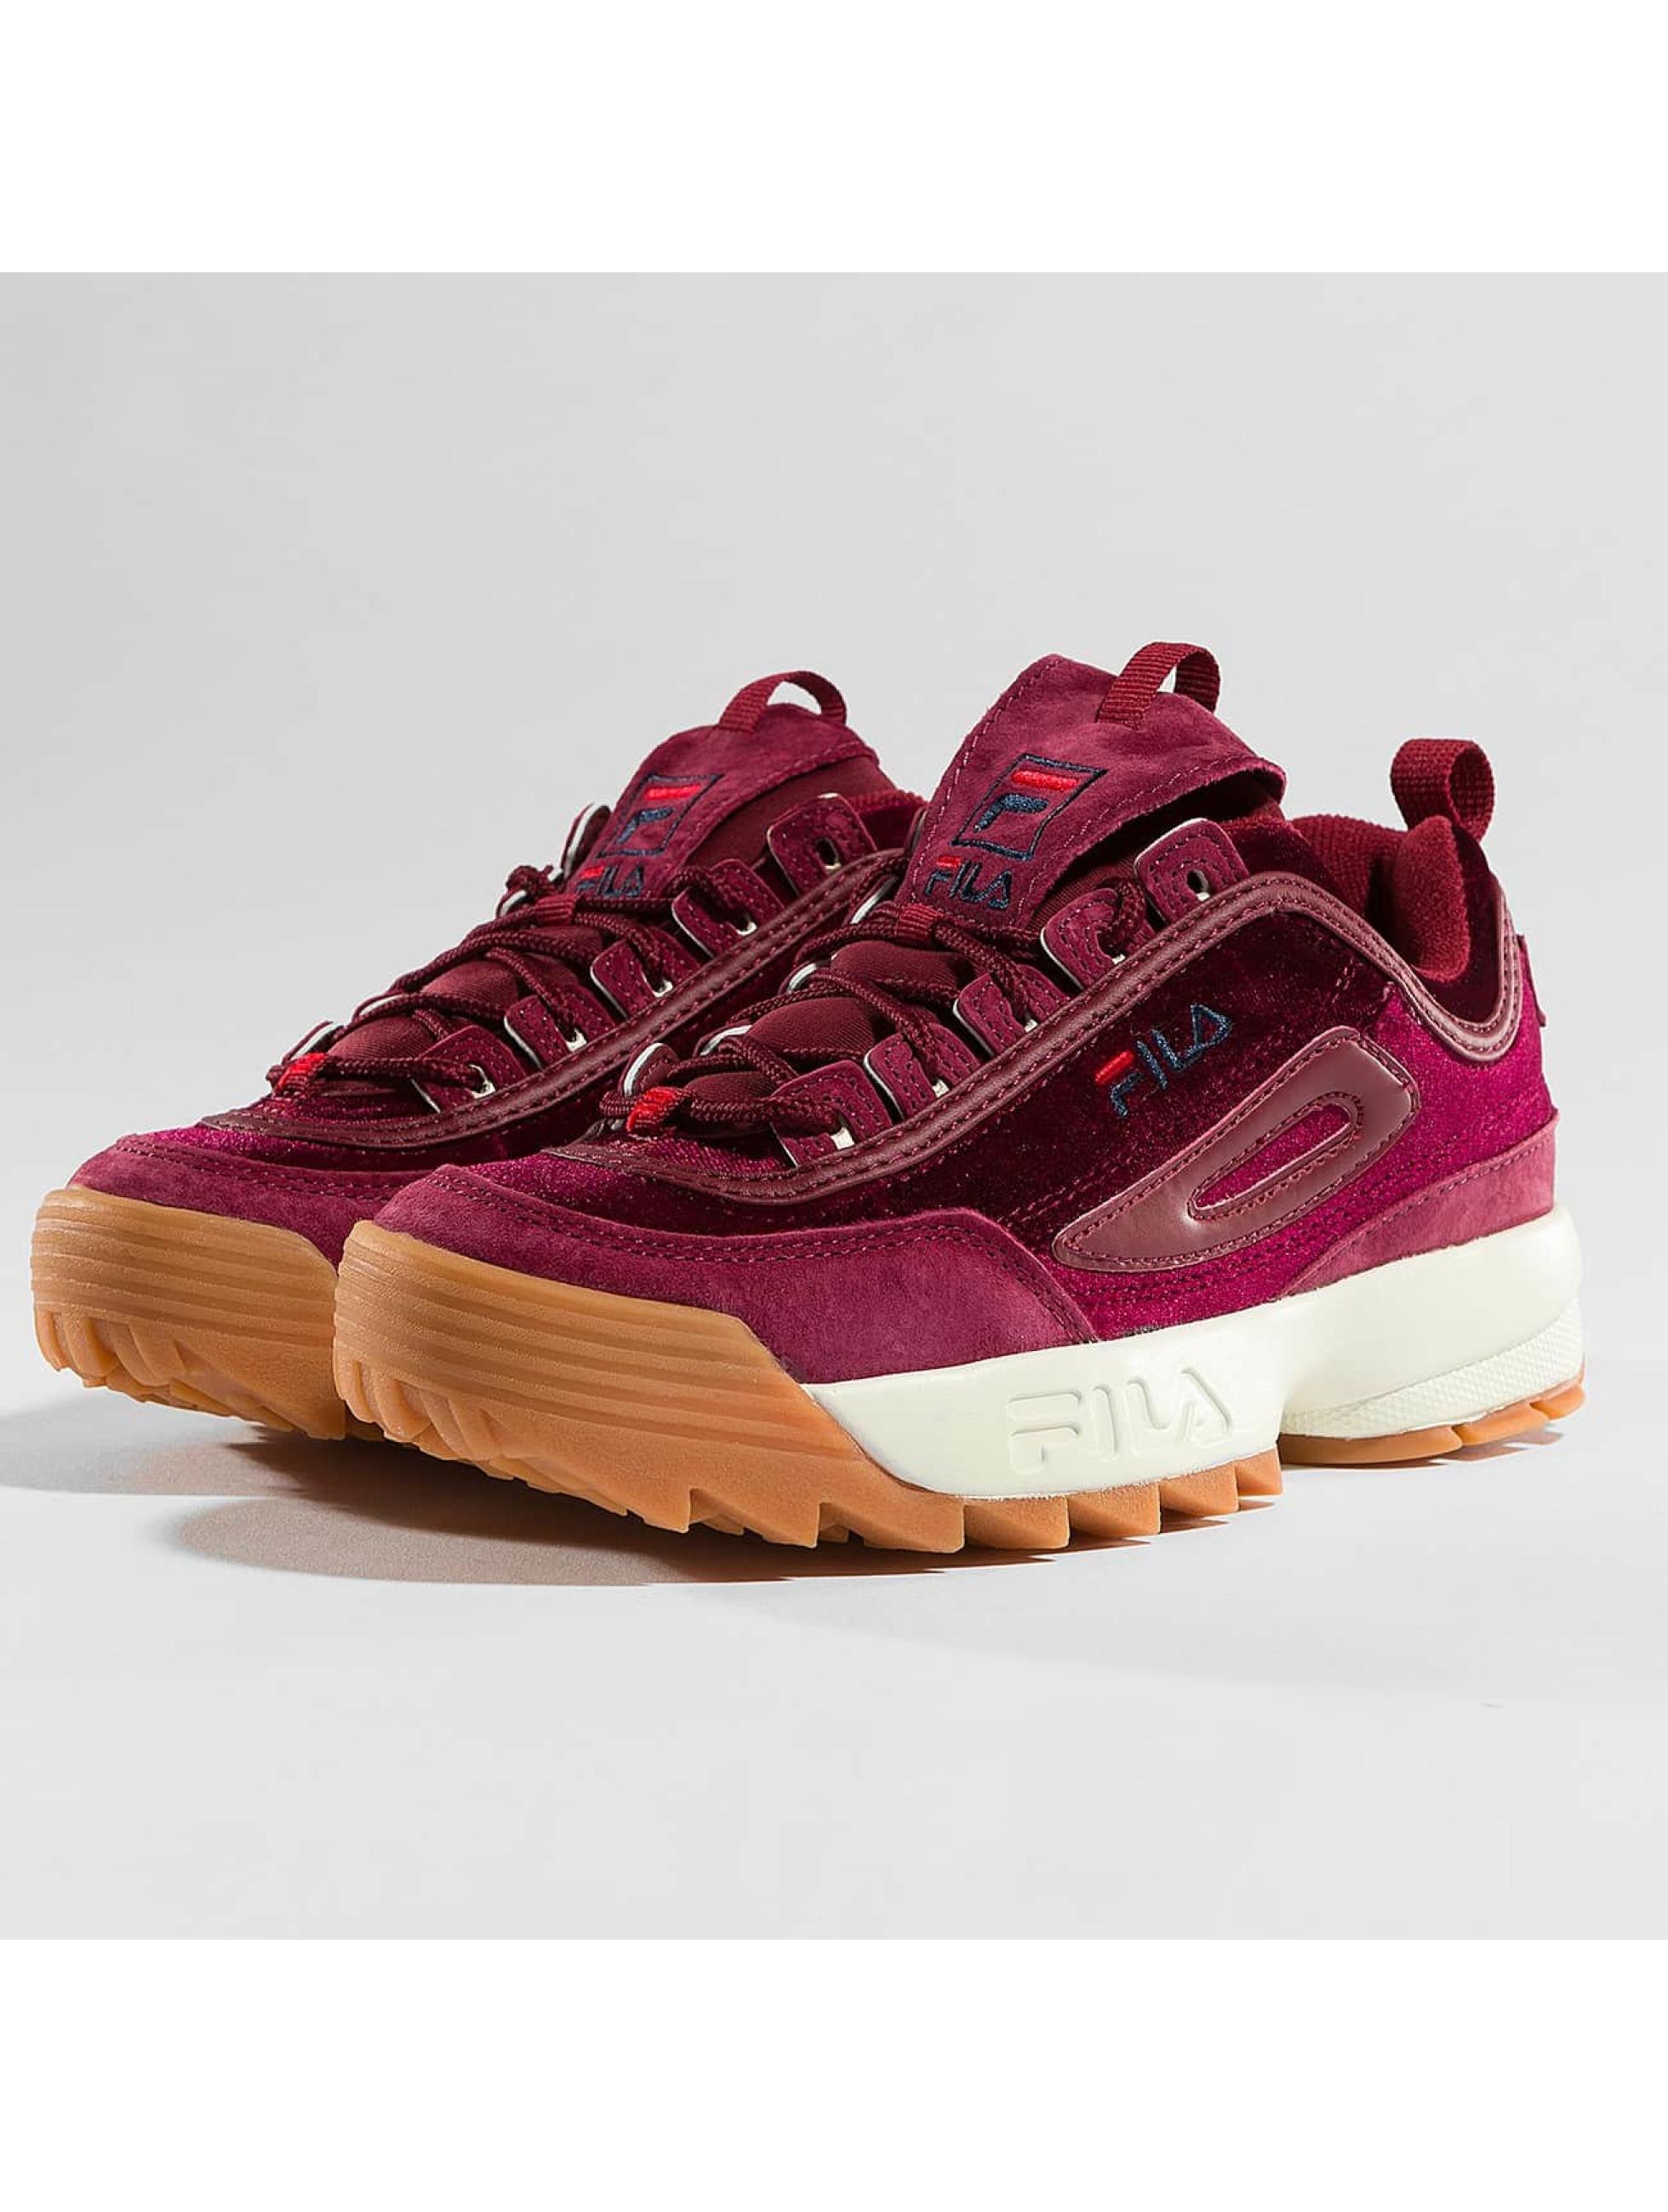 FILA Sneakers Heritage Disruptor czerwony